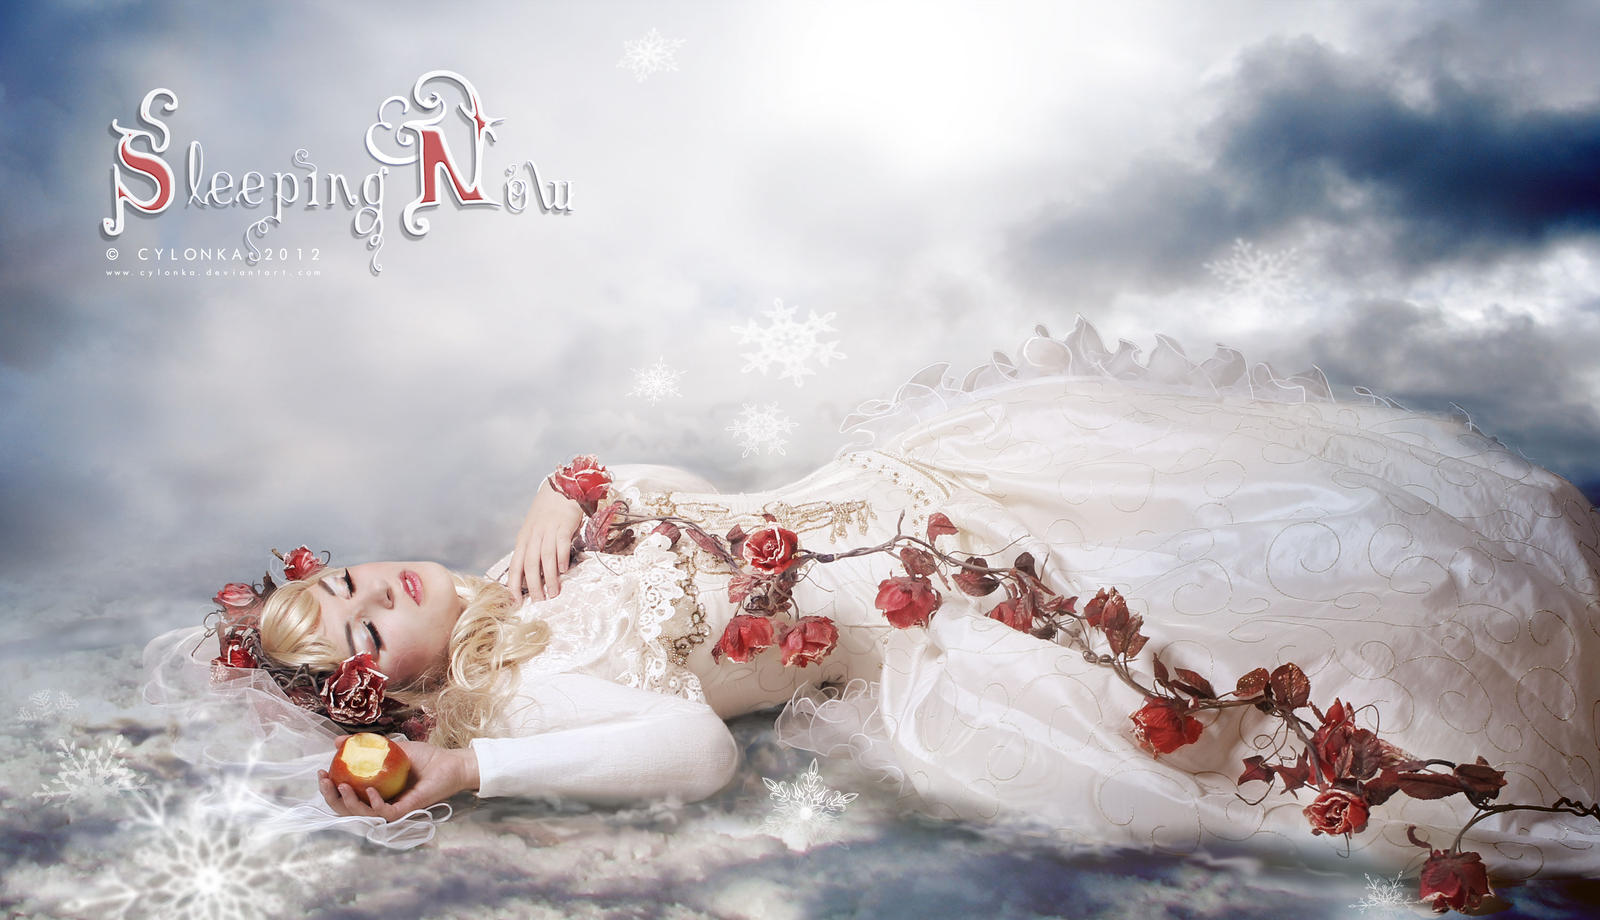 Sleeping now by cylonka